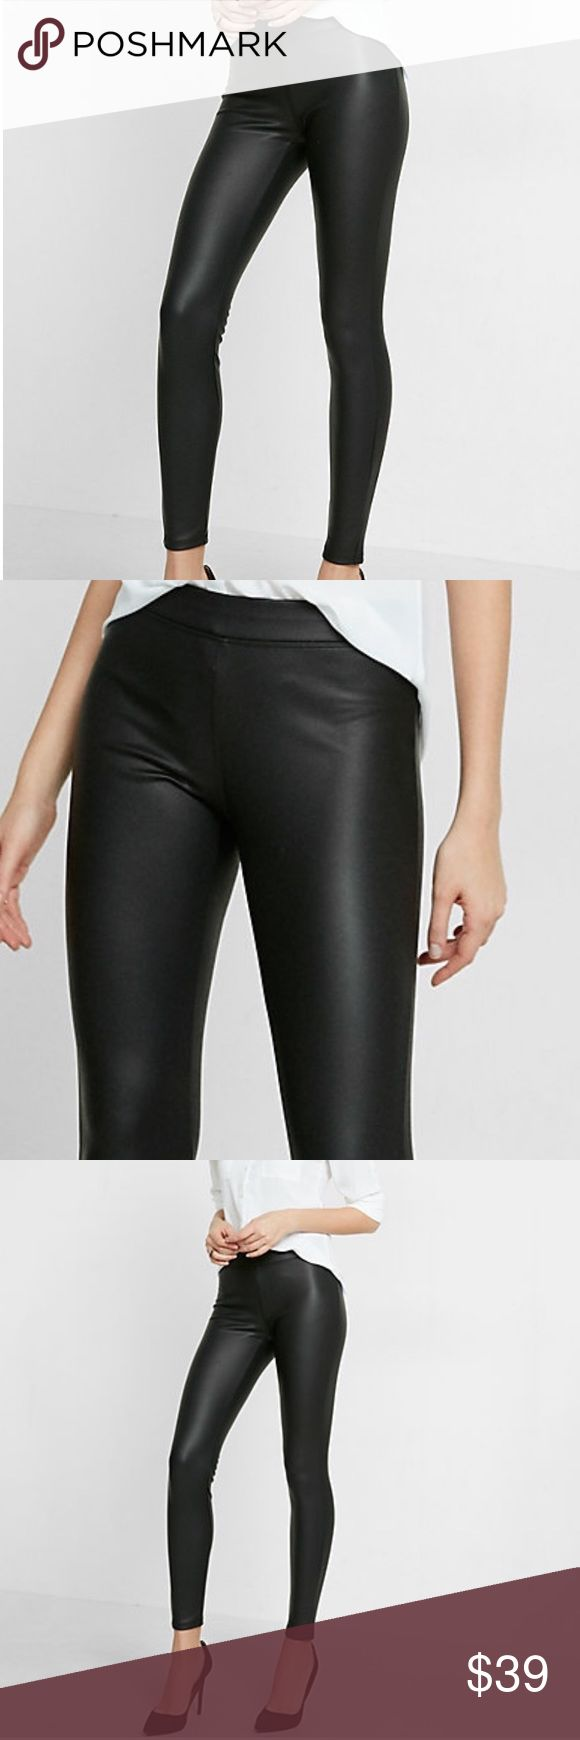 Express Faux Leather Leggings- Size L Express Faux Leather Leggings- Size L Express Pants Leggings